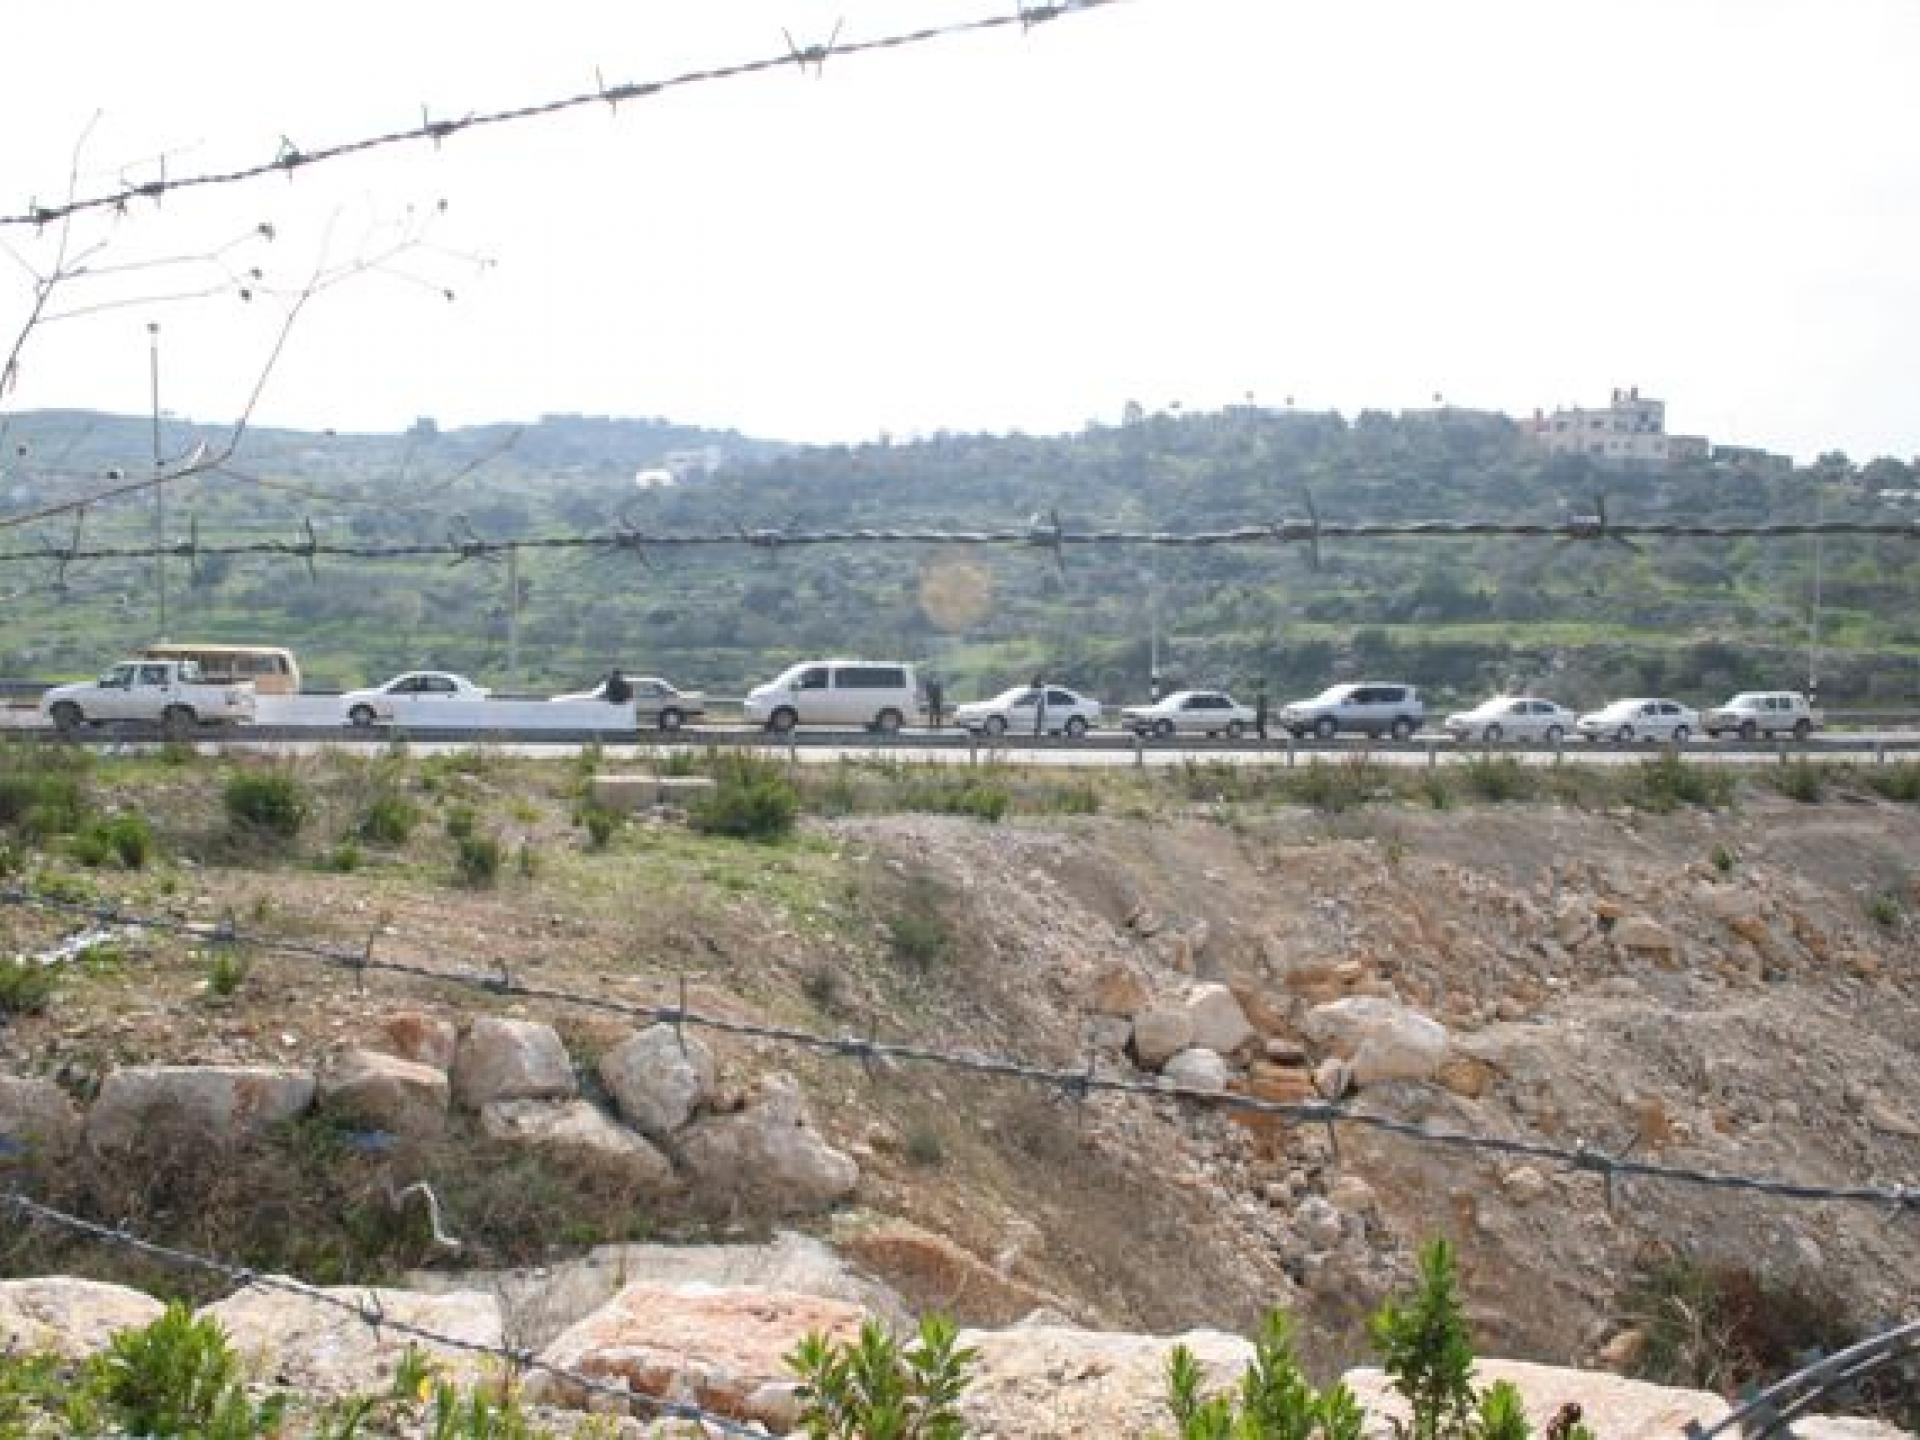 Barta'a/Reikhan checkpoint 01.03.08